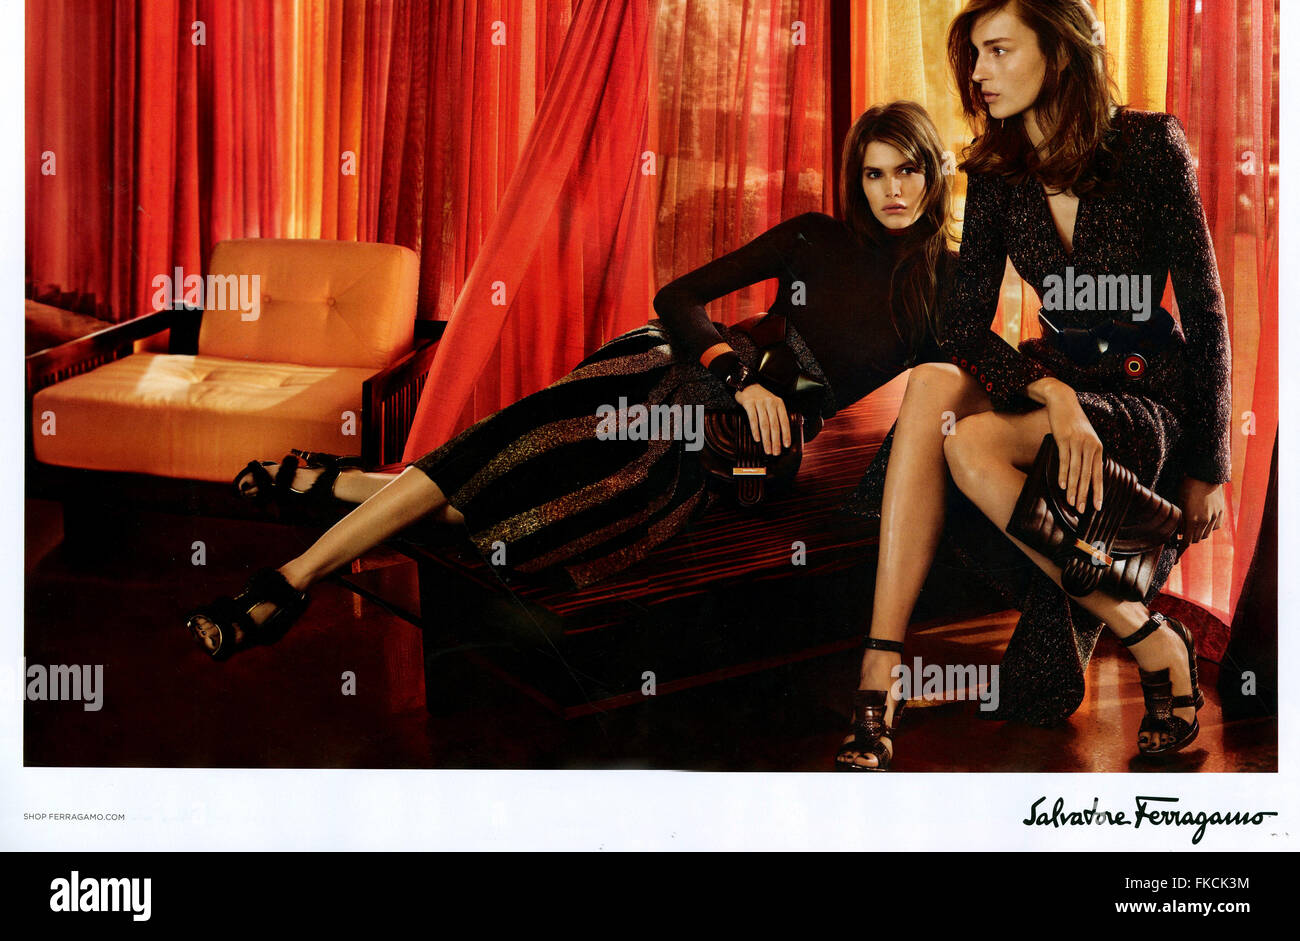 2010s UK Salvatore Ferragamo Magazine Advert - Stock Image